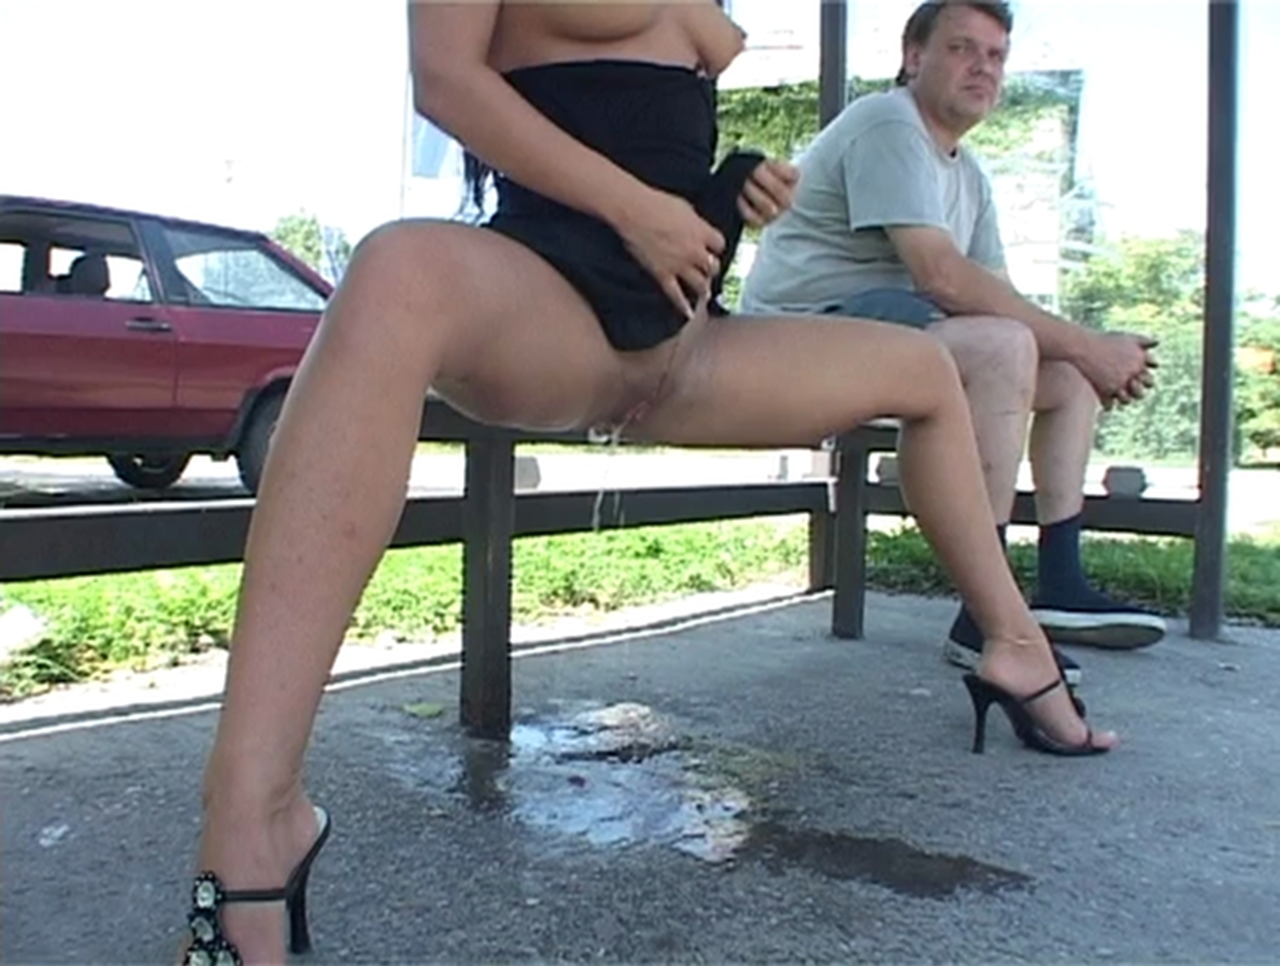 Shyla stylez rough sex from behind